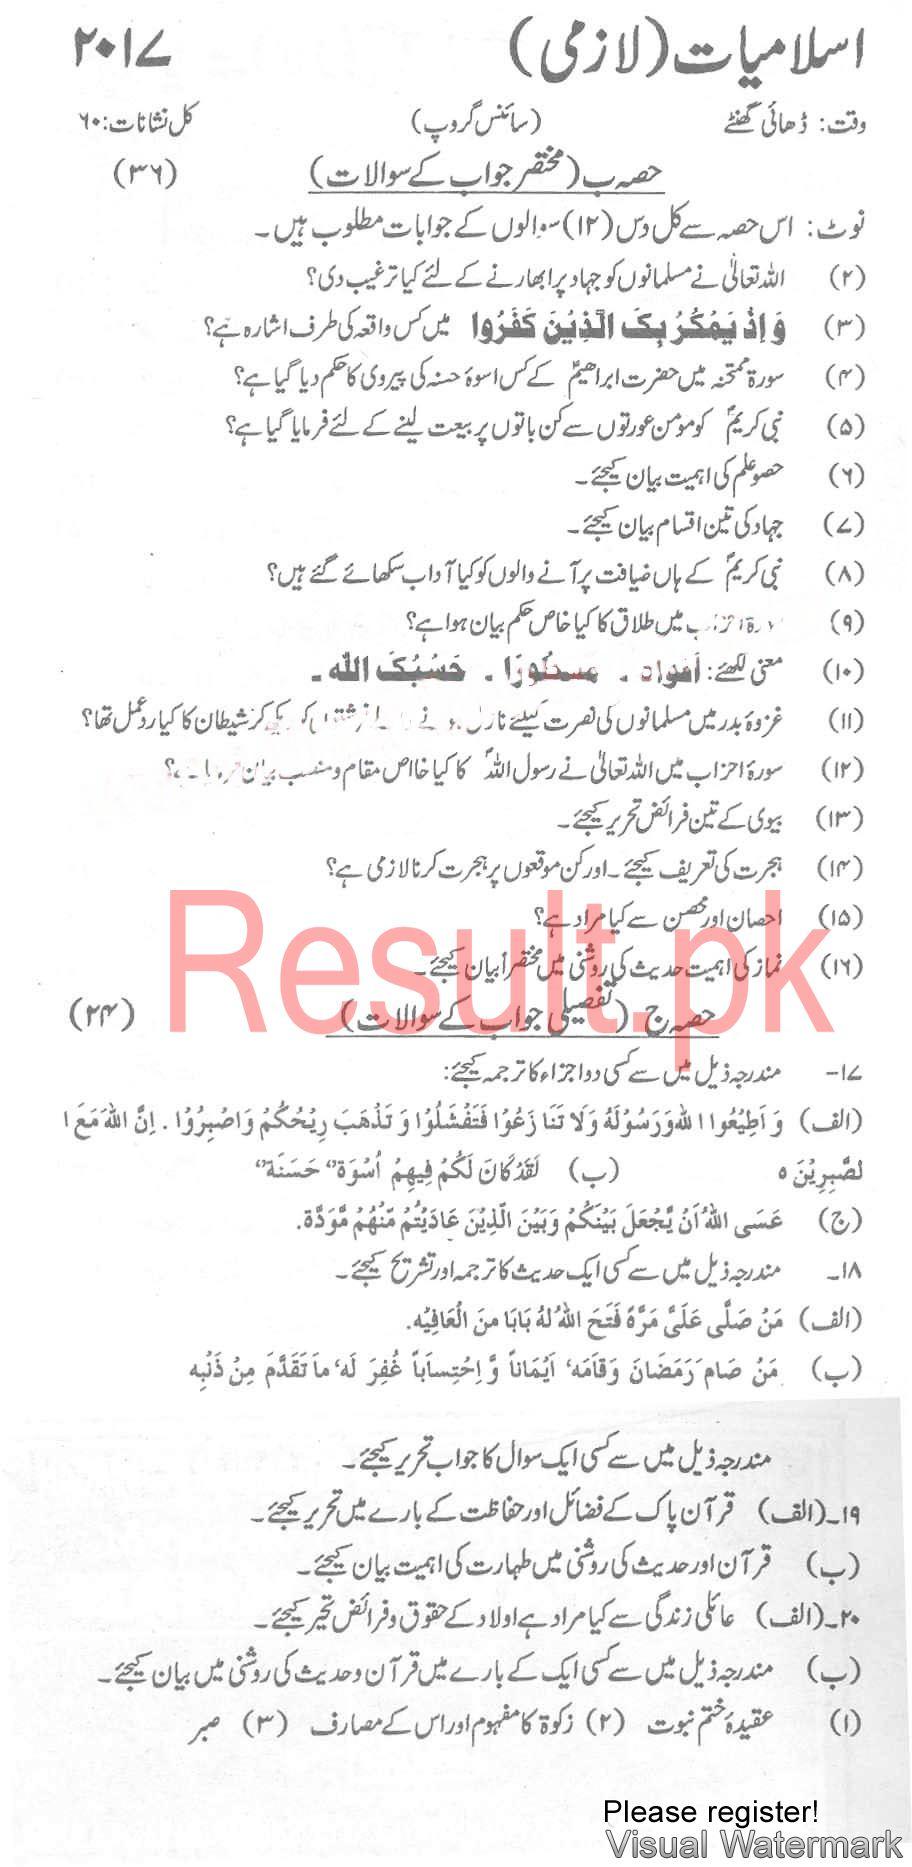 University of Karachi Past Papers 2018, 2017, 2016, uok Past